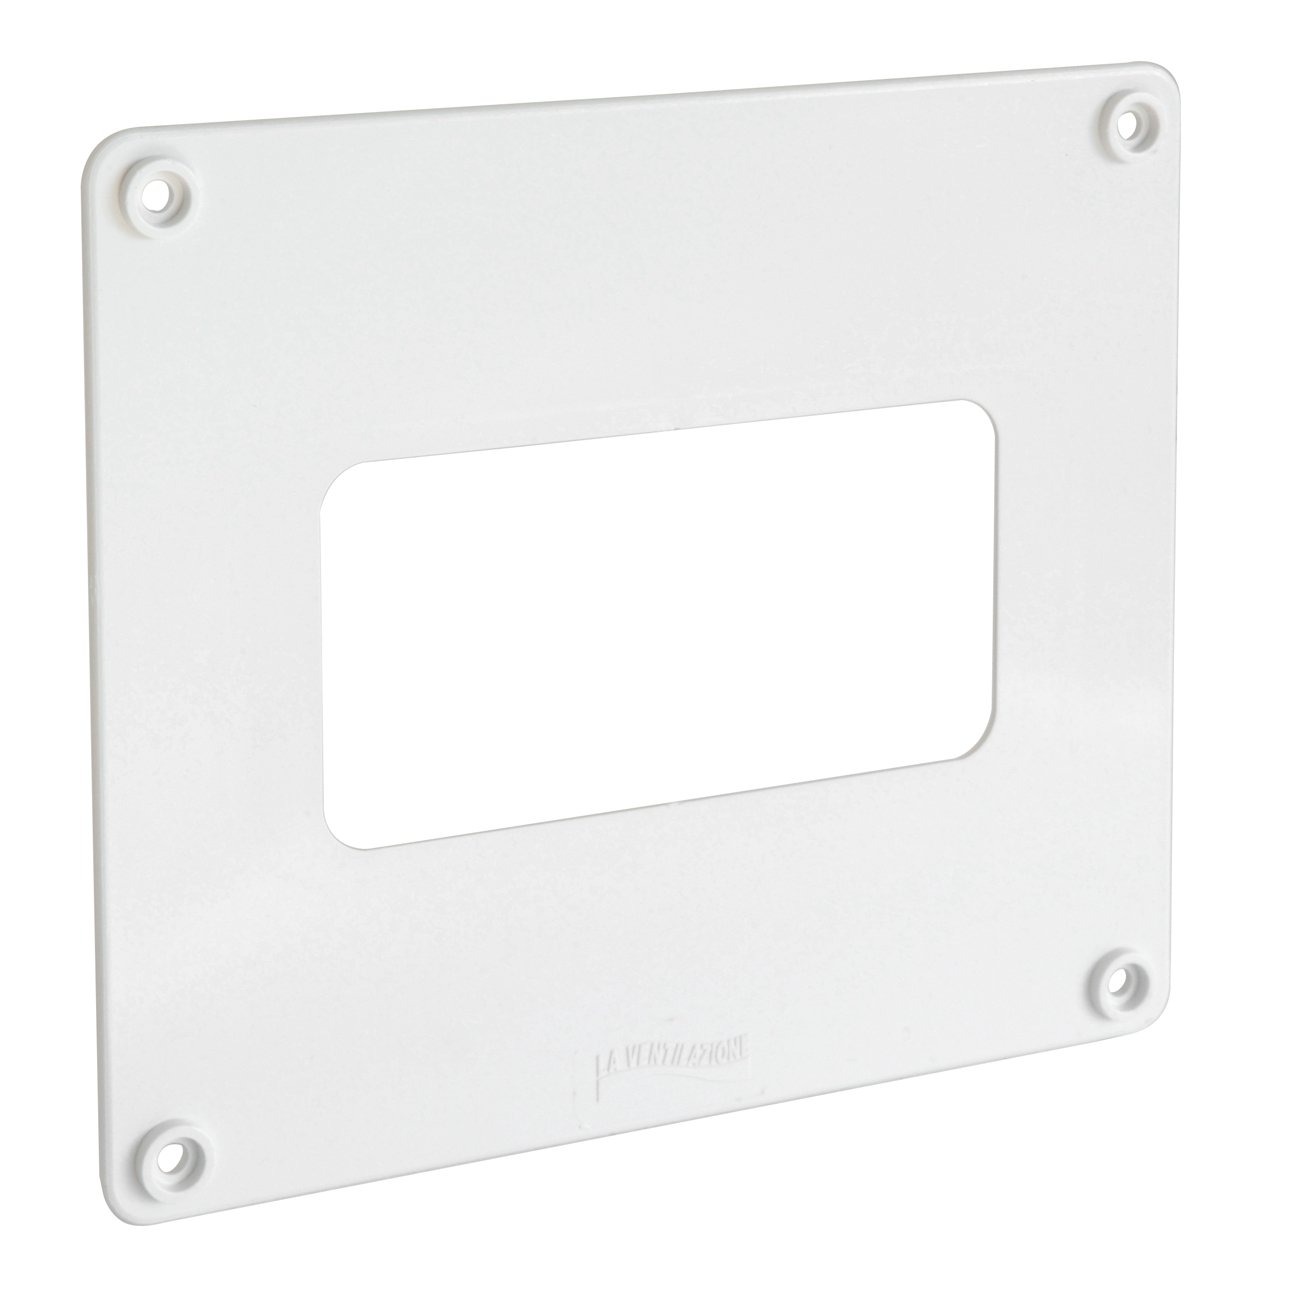 La ventilaci/ón cf1916126b copriforo blanco de ABS para tubos rectangulares 150/x 70/ /120/x 60/mm